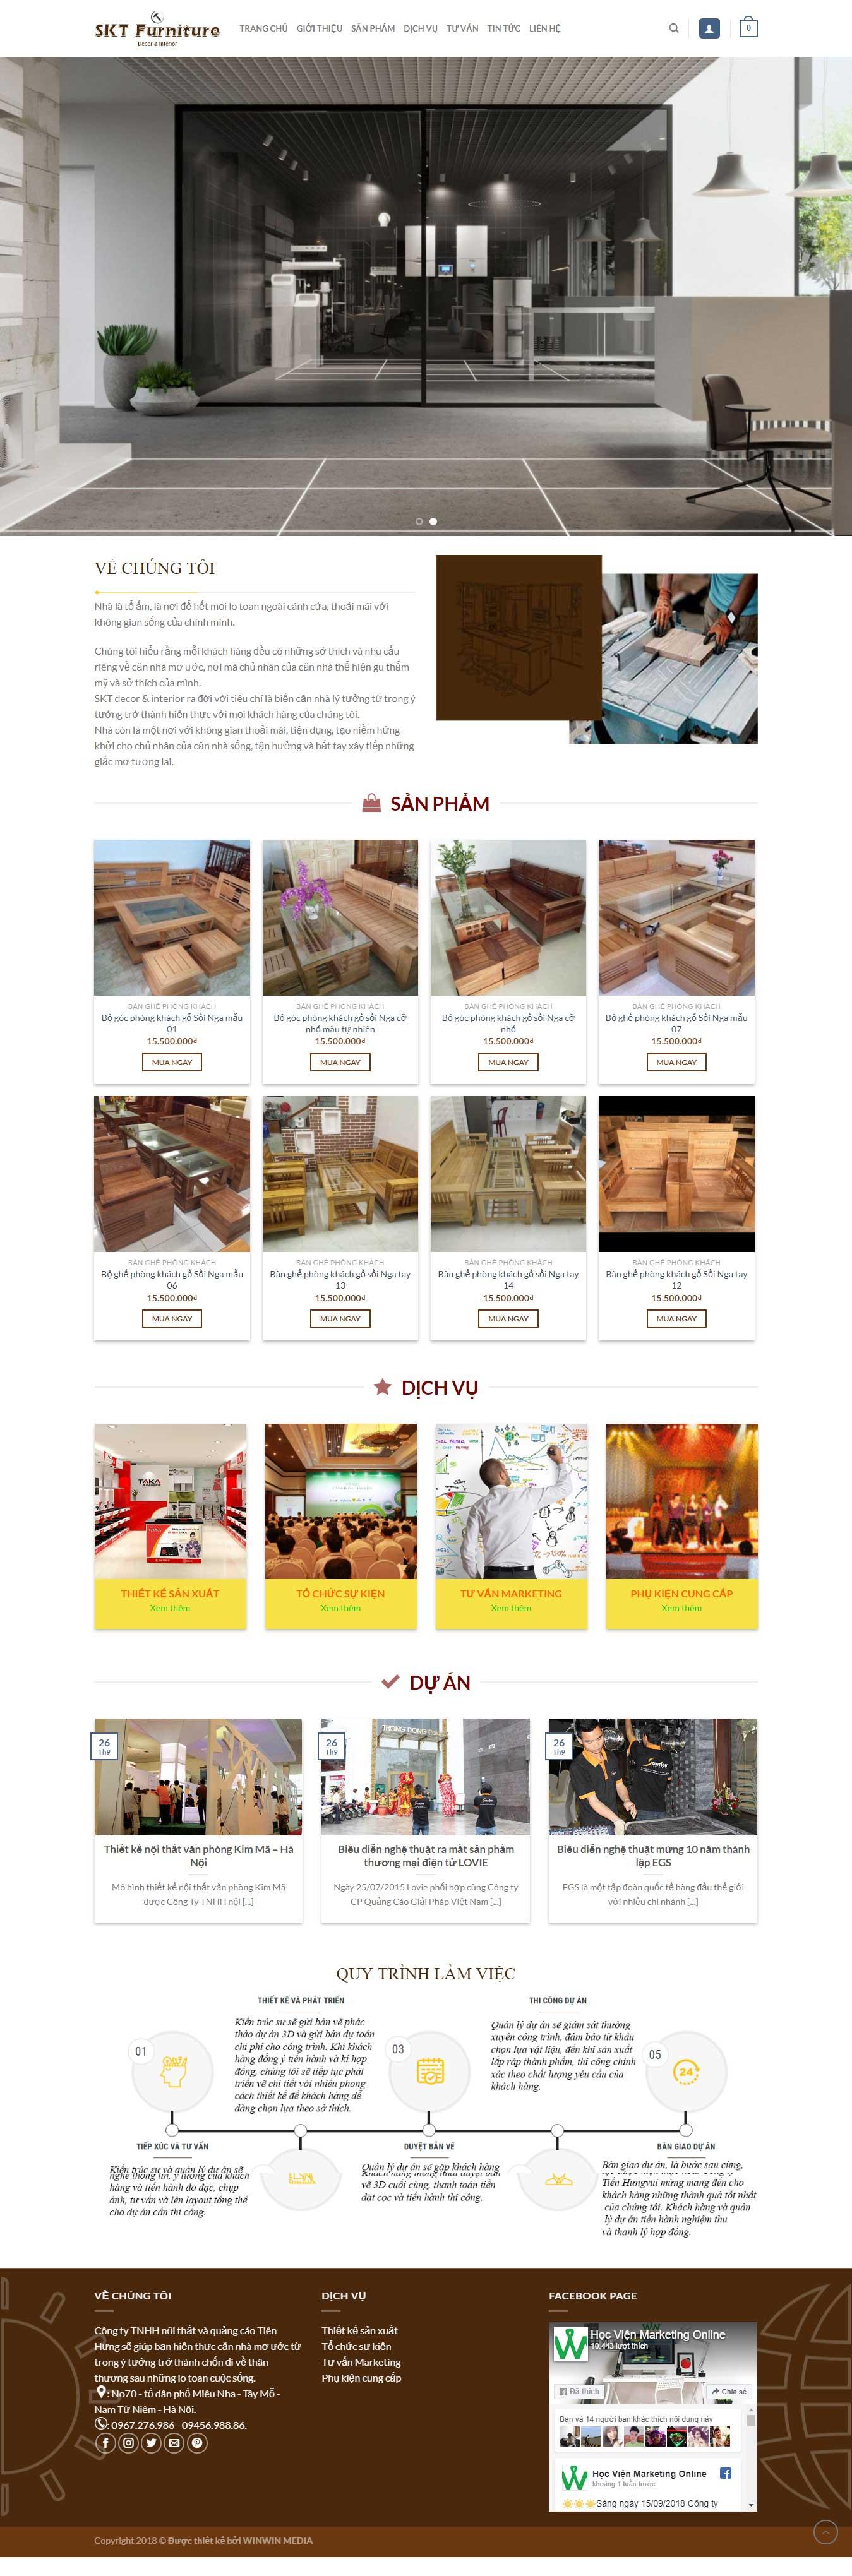 Mẫu website cửa hàng Nội Thất